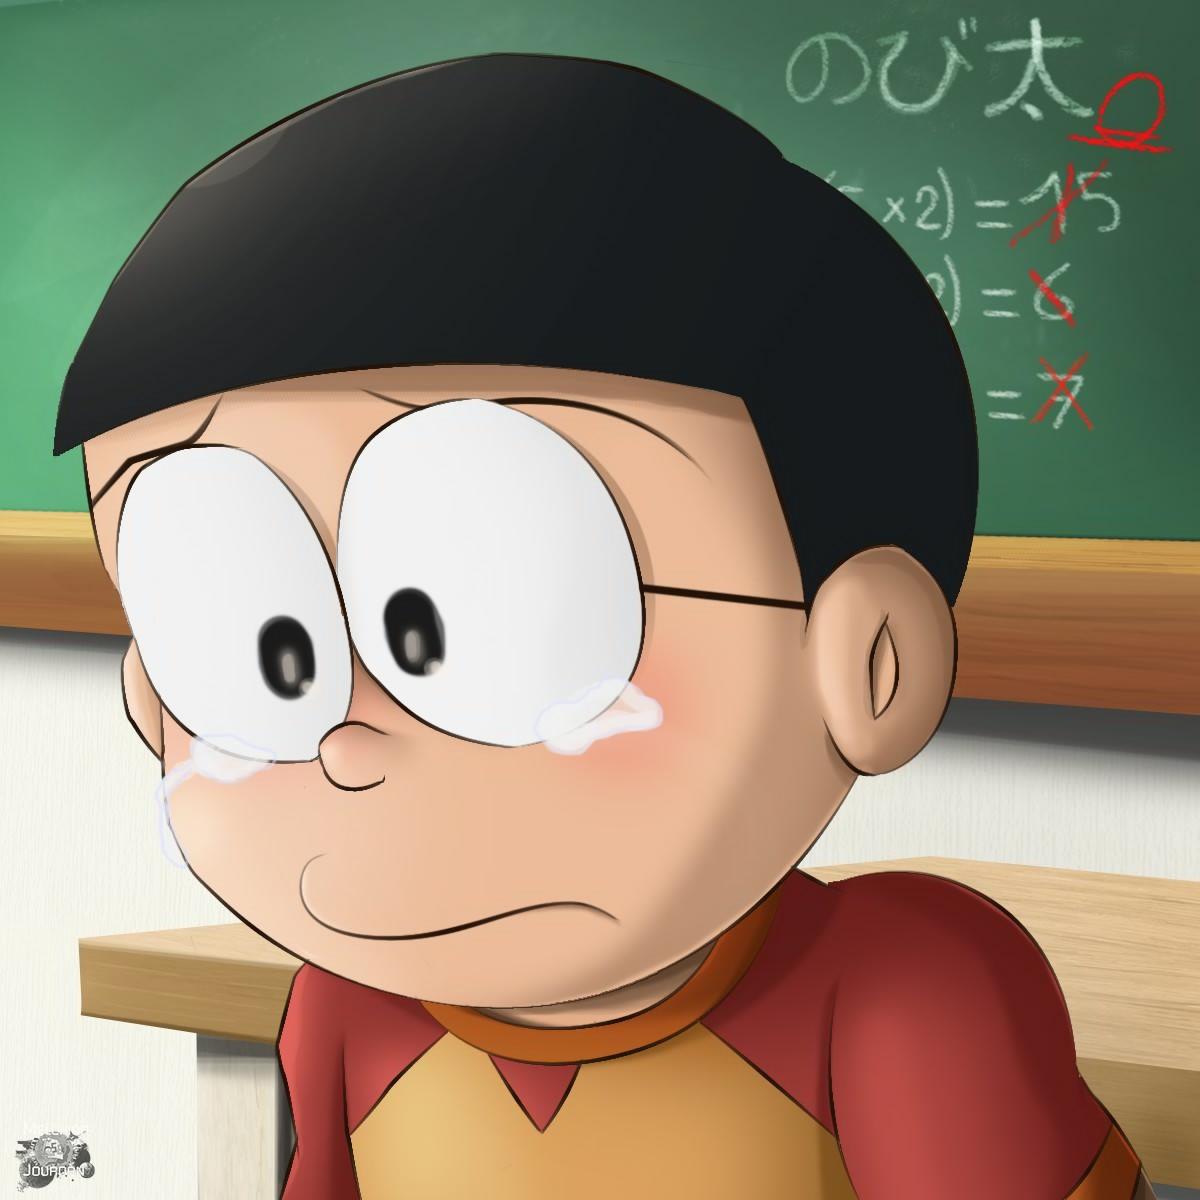 Sad Nobita Crying Image